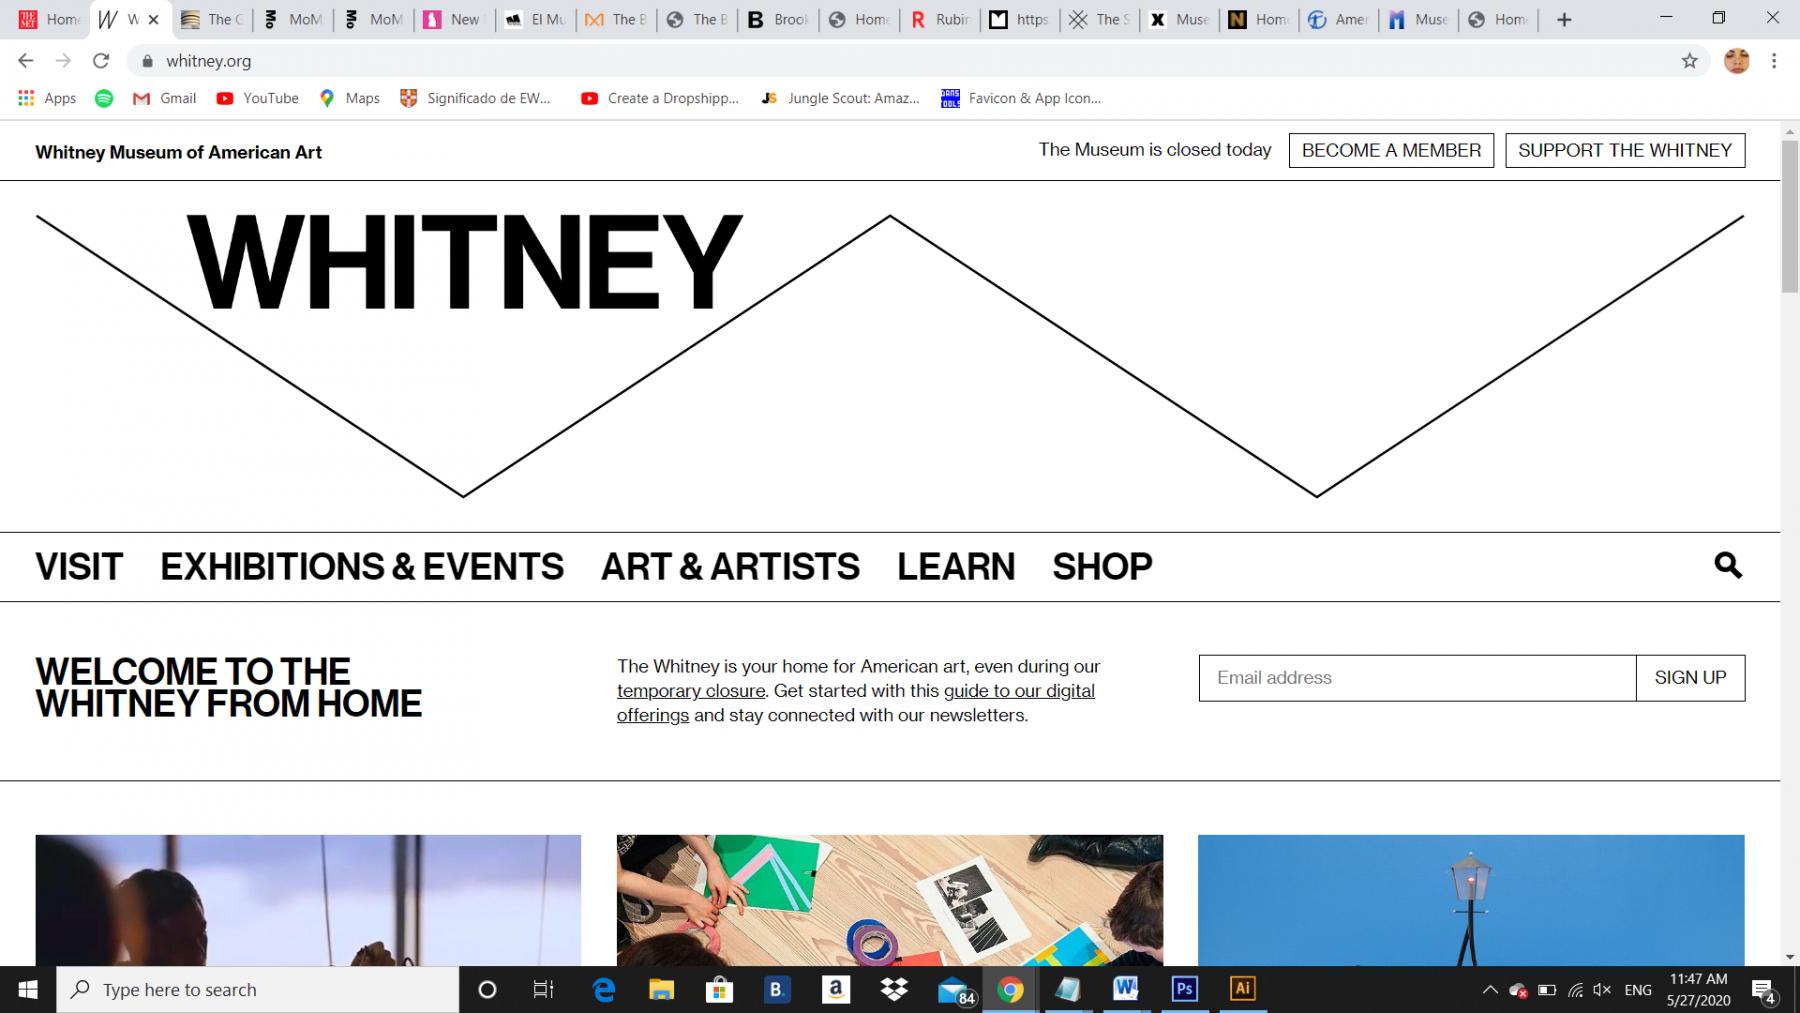 www.whitney.org-2020-Photography-Naivy-Perez